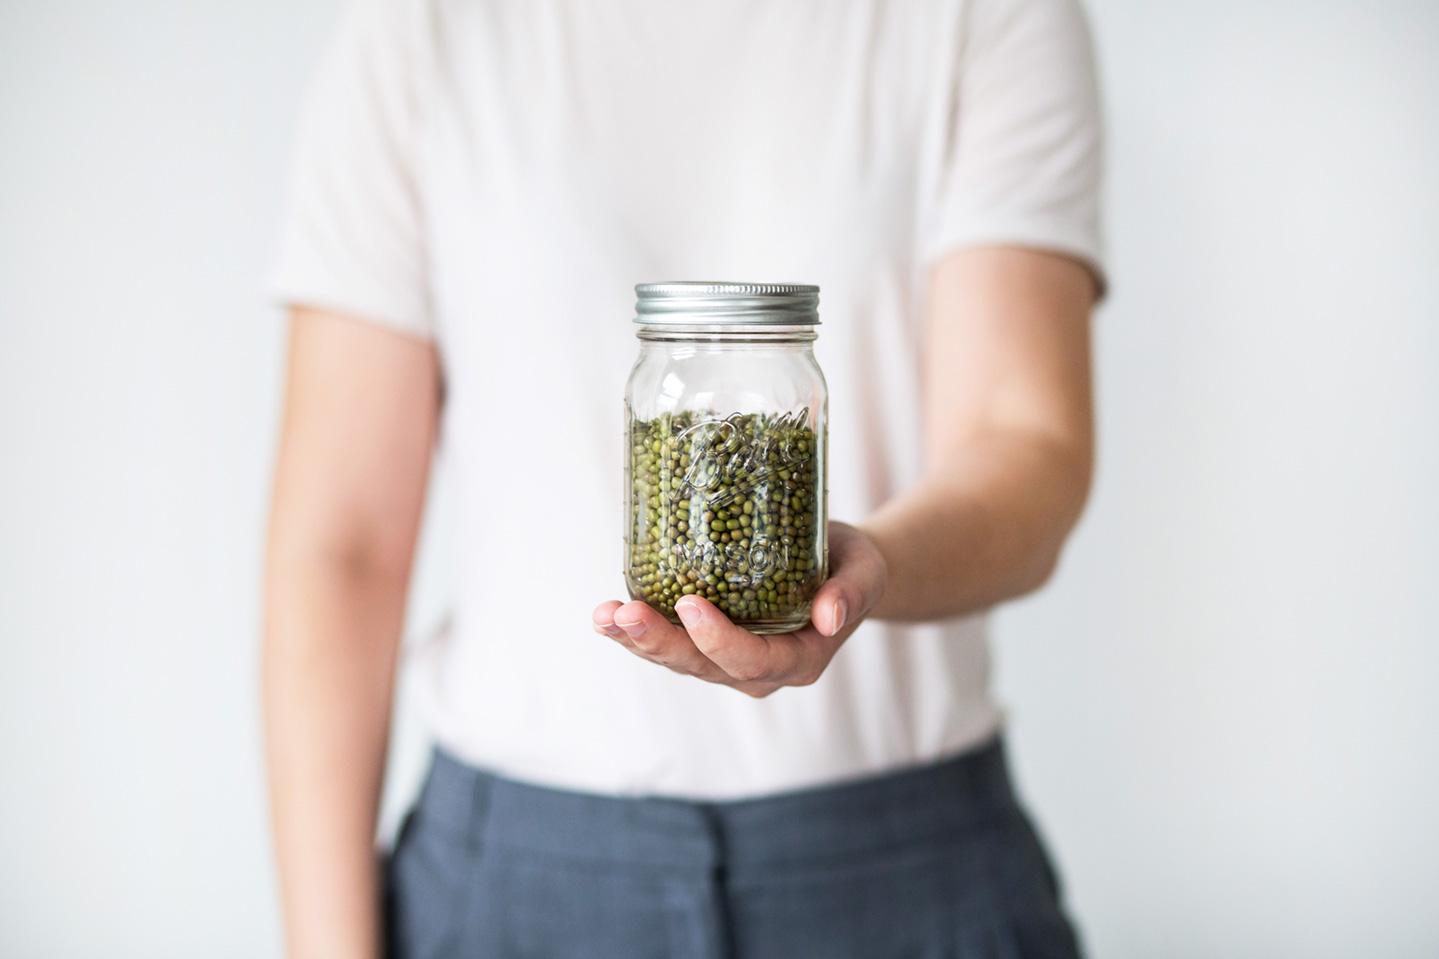 waste free packaging man holding jar